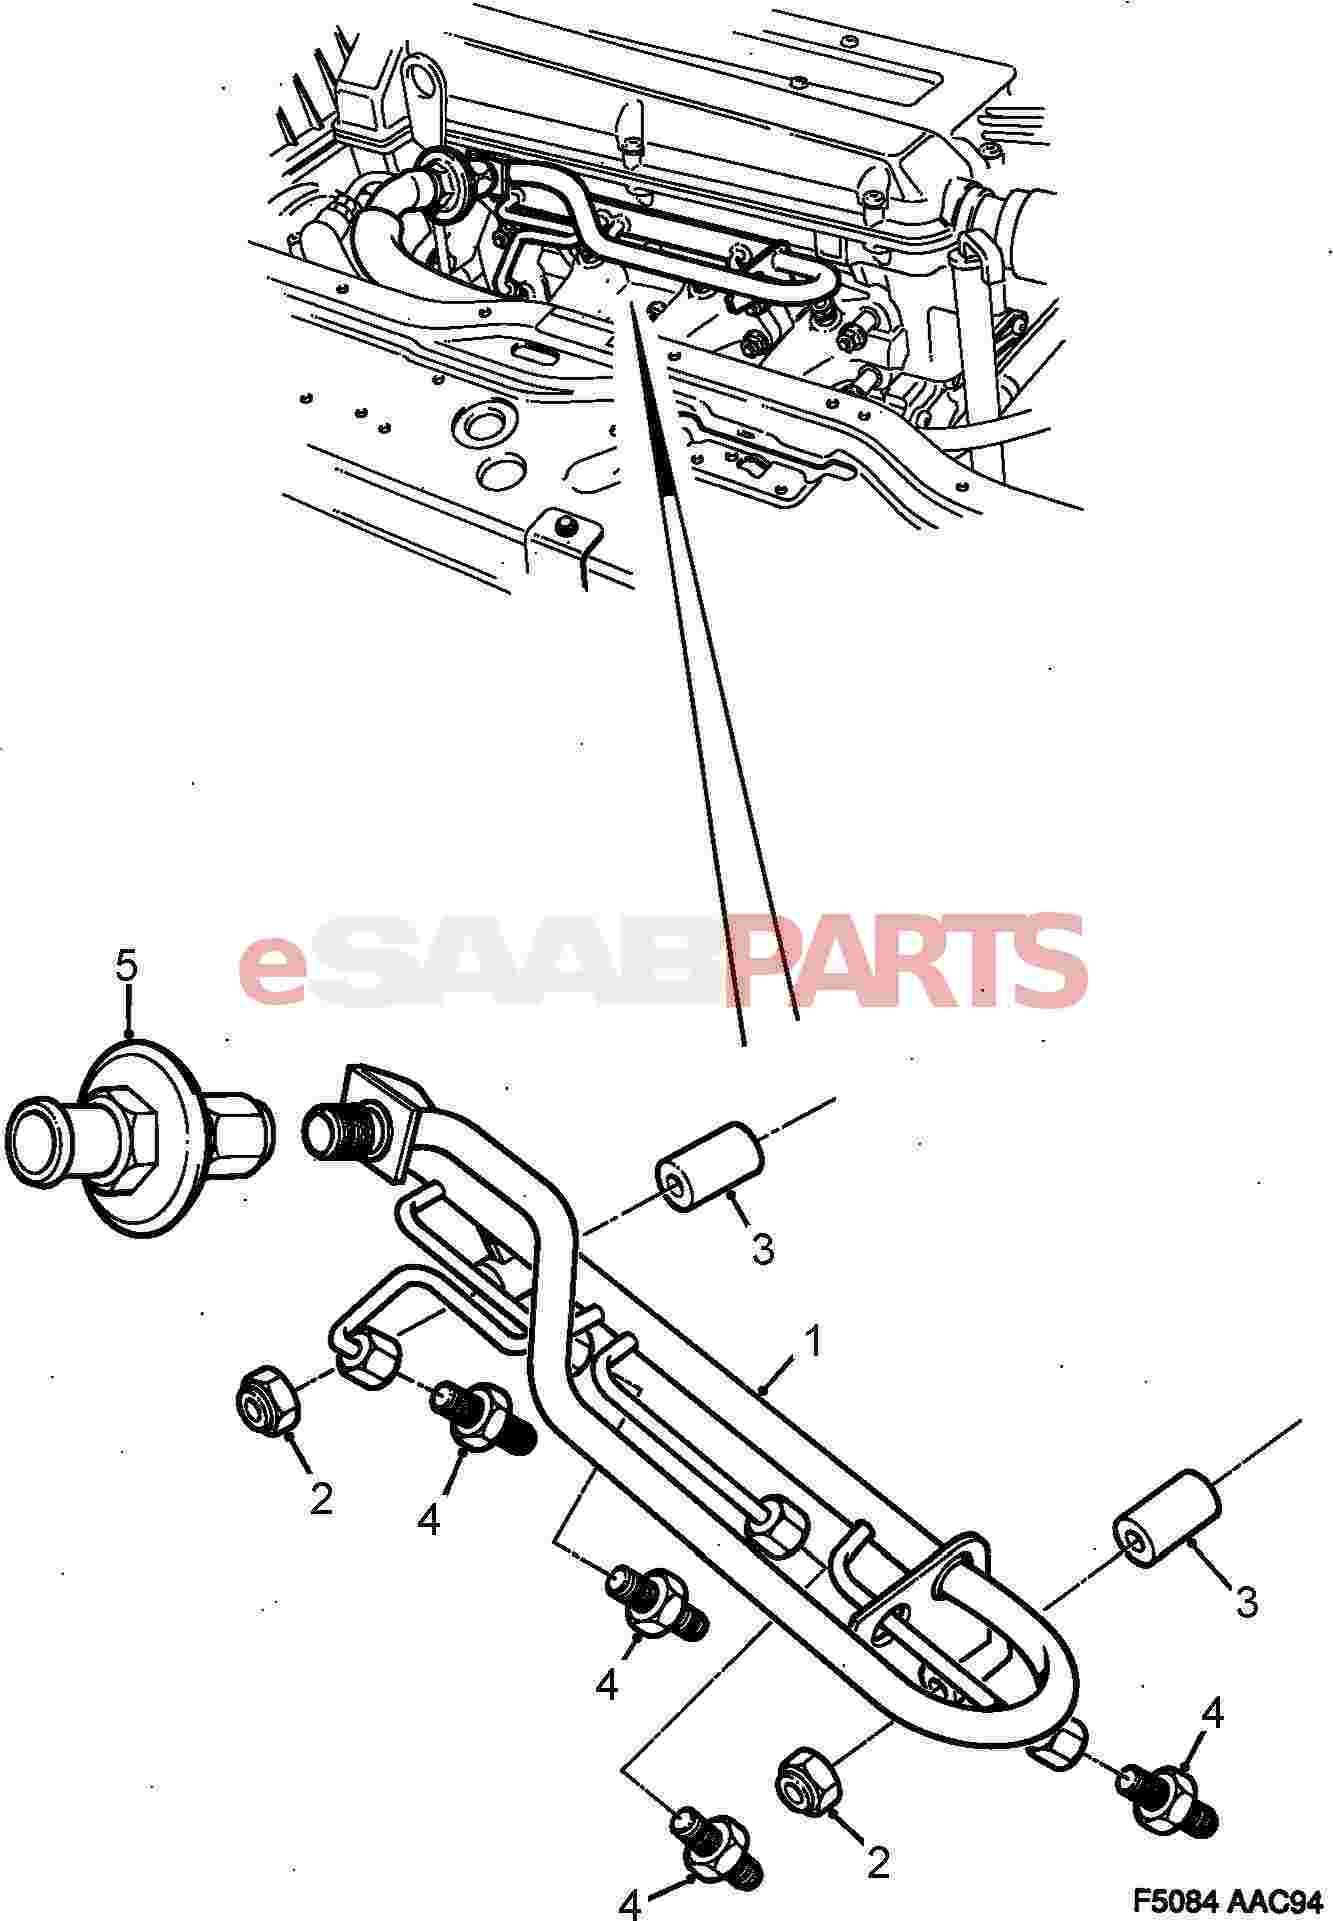 Cadillac Dts Engine Diagram Wiring Diagrams. Cadillac